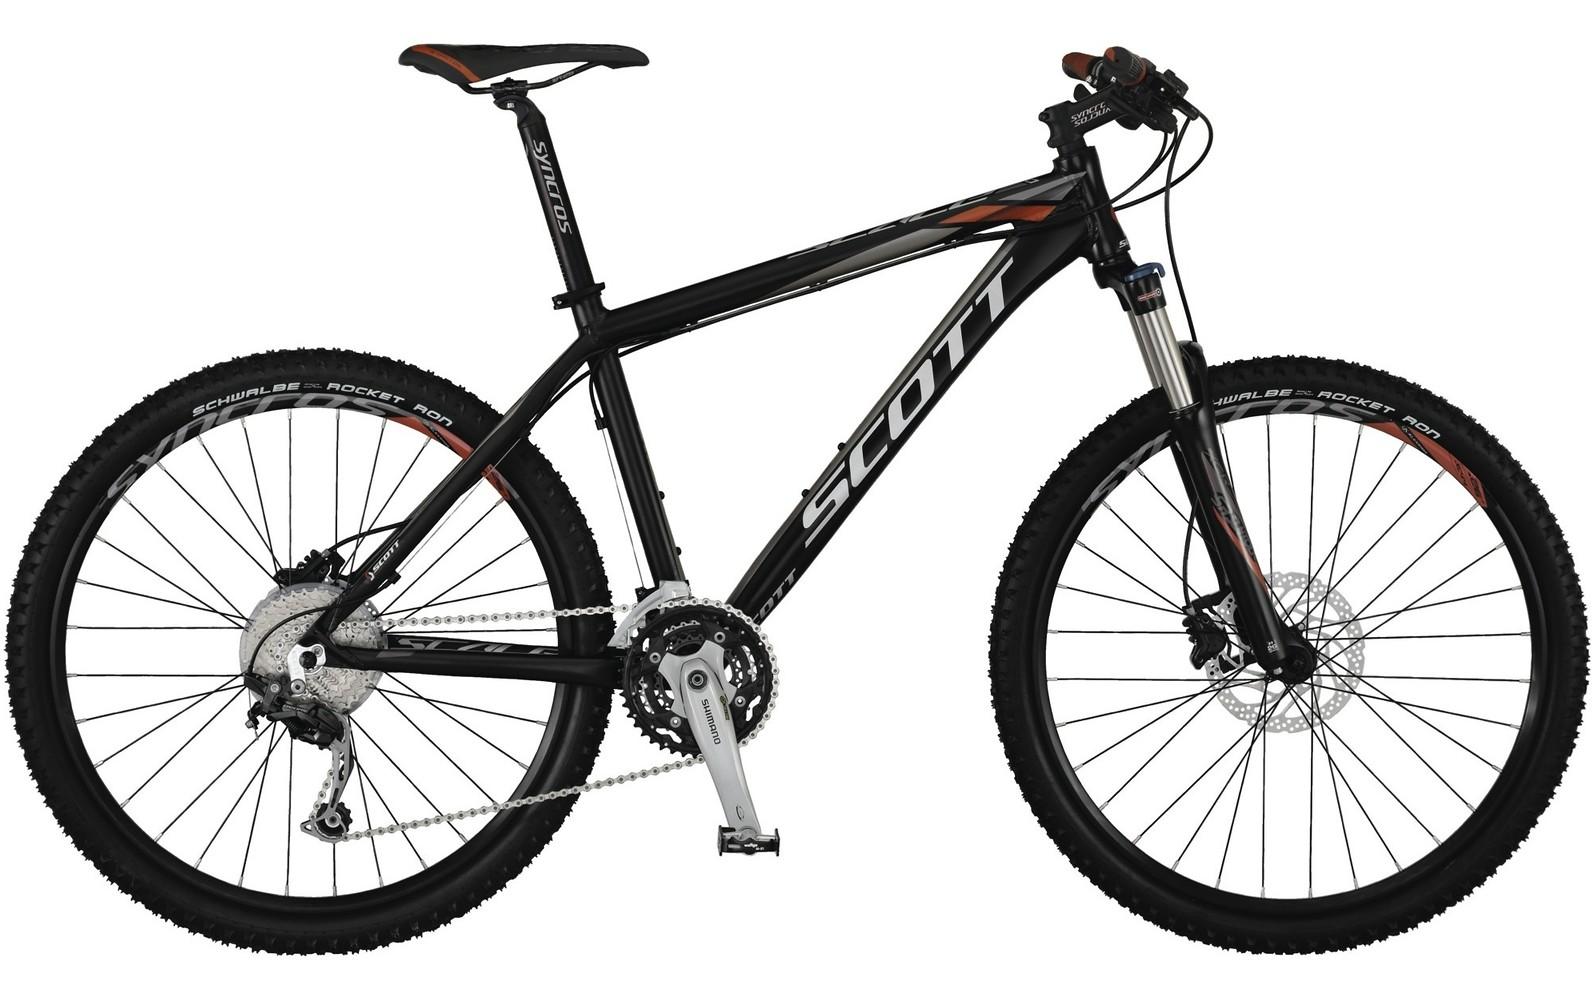 2013 Scott Scale 670 Bike SCOTT Scale 670 Bike